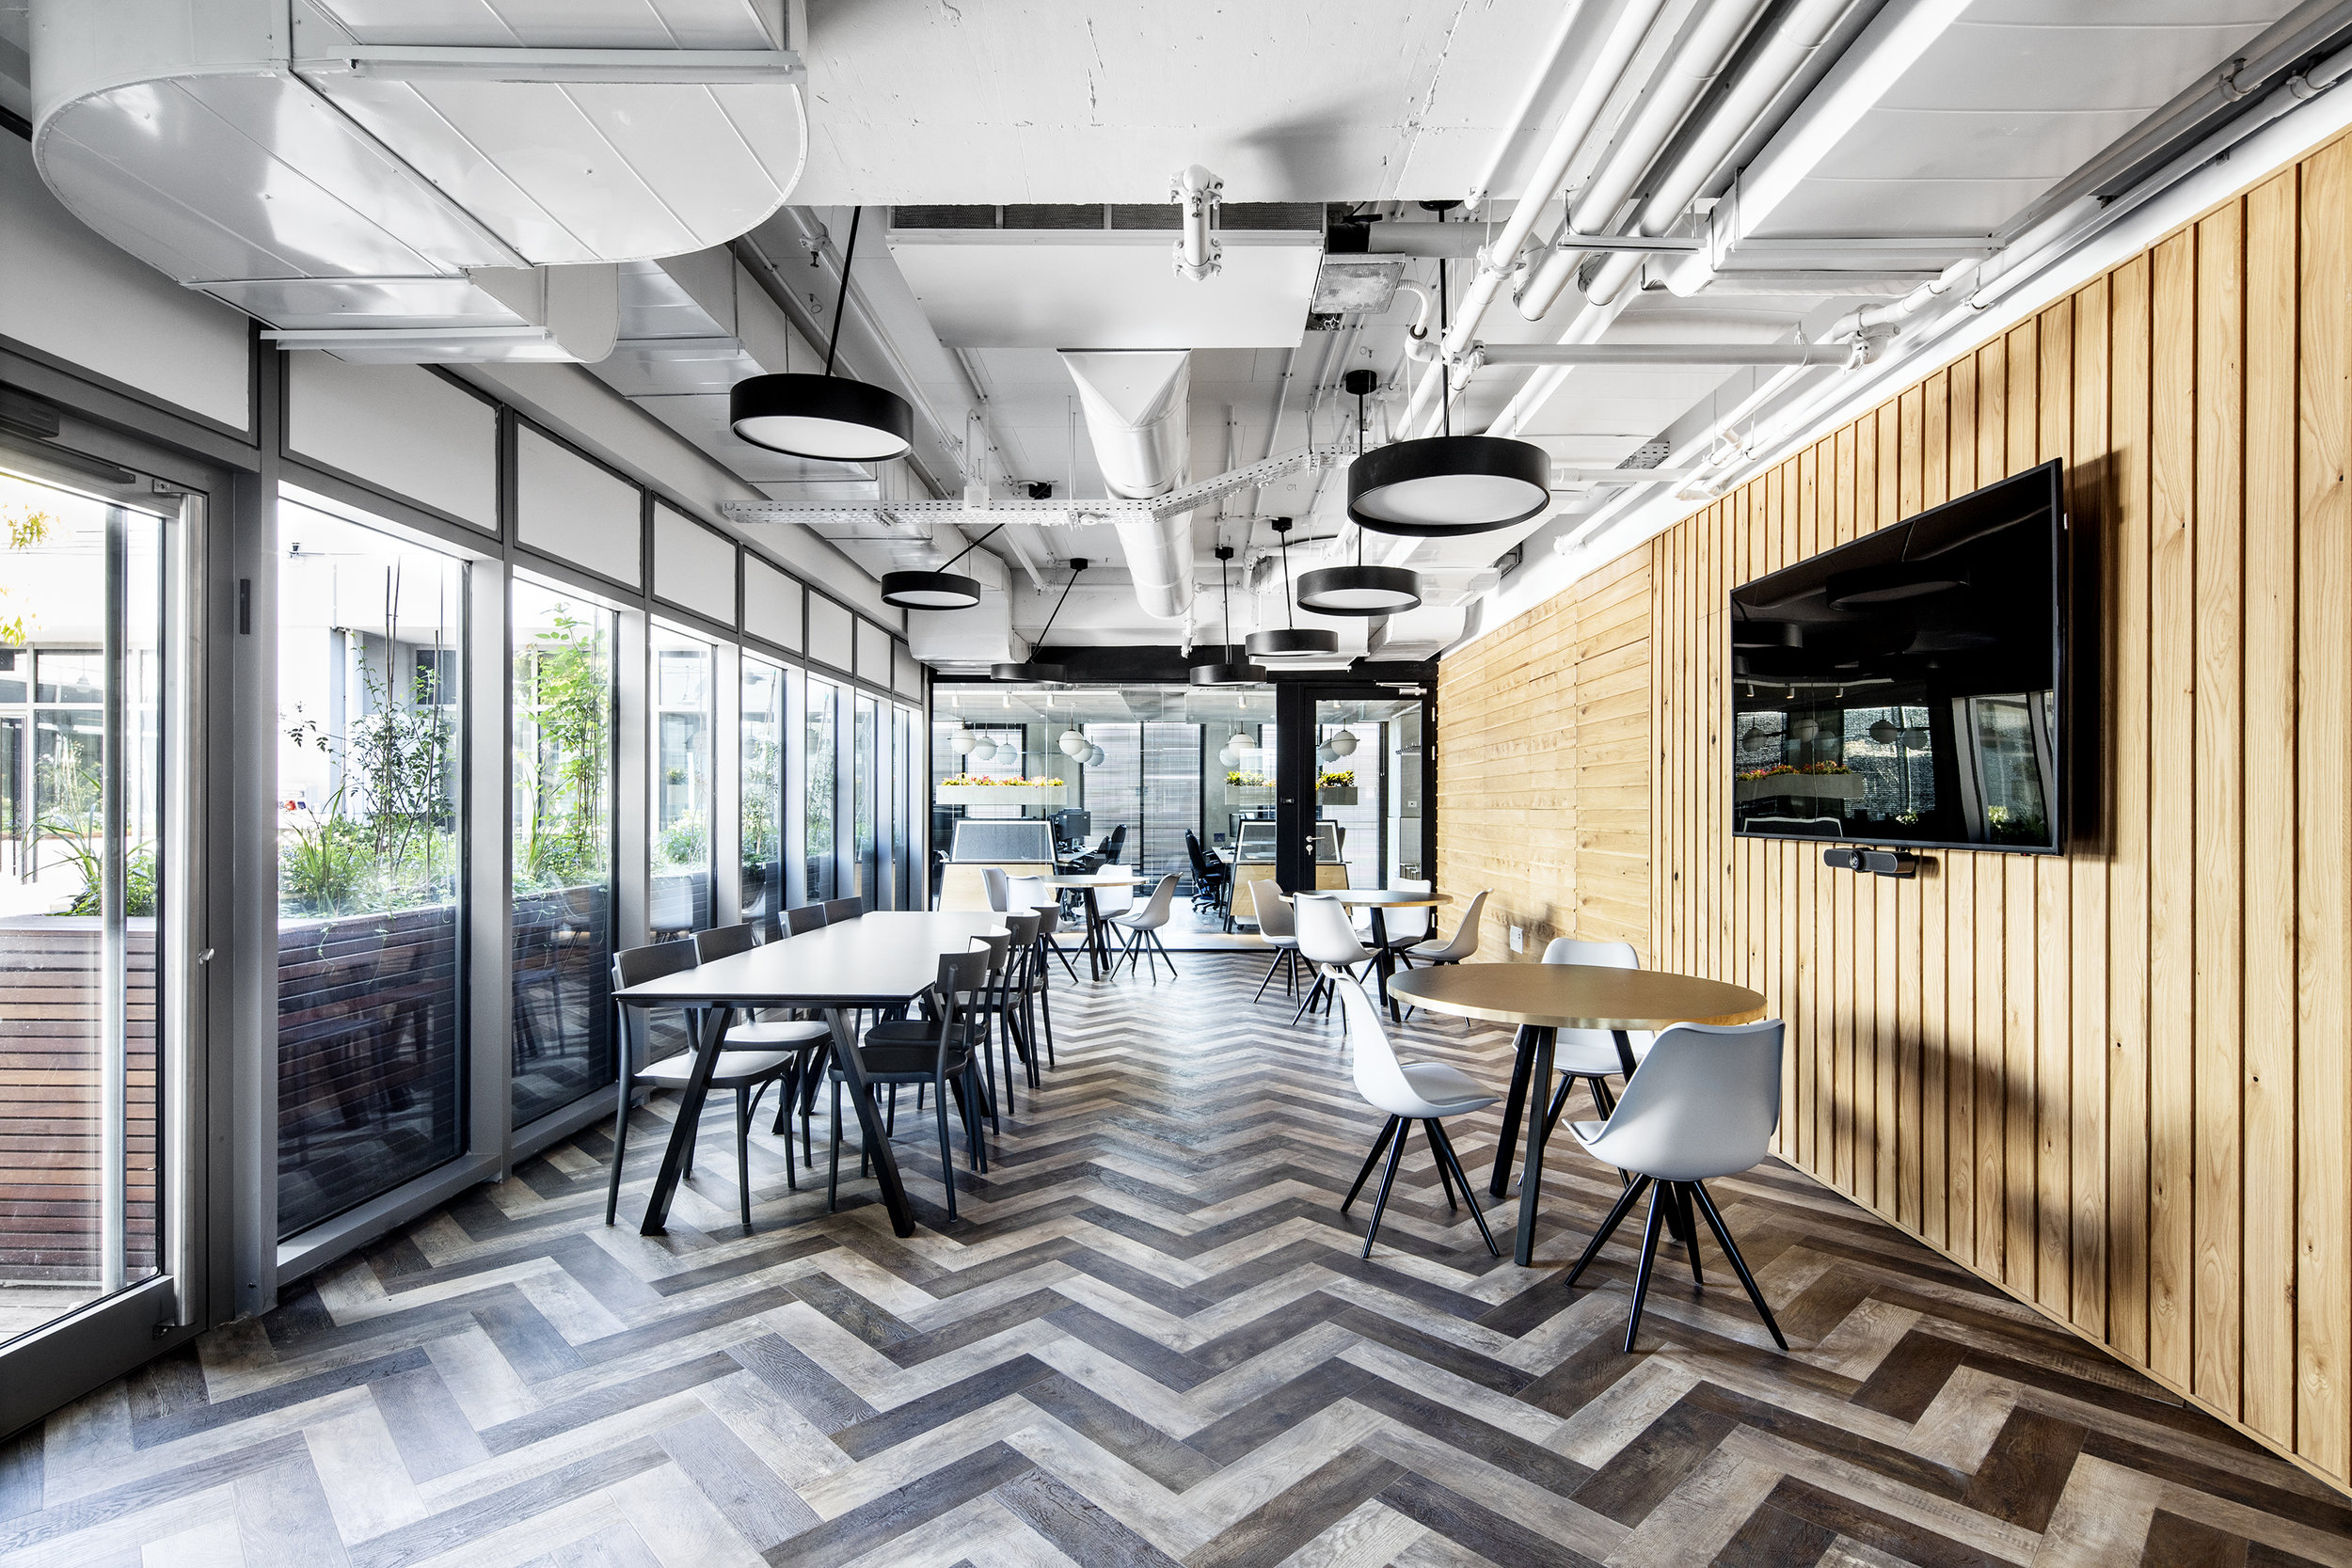 R2NET OFFICES - ROY DAVID ARCHITECTURE  STUDIO - רואי דוד אדריכלות סטודיו אדריכלים - אר2נט (23).jpg